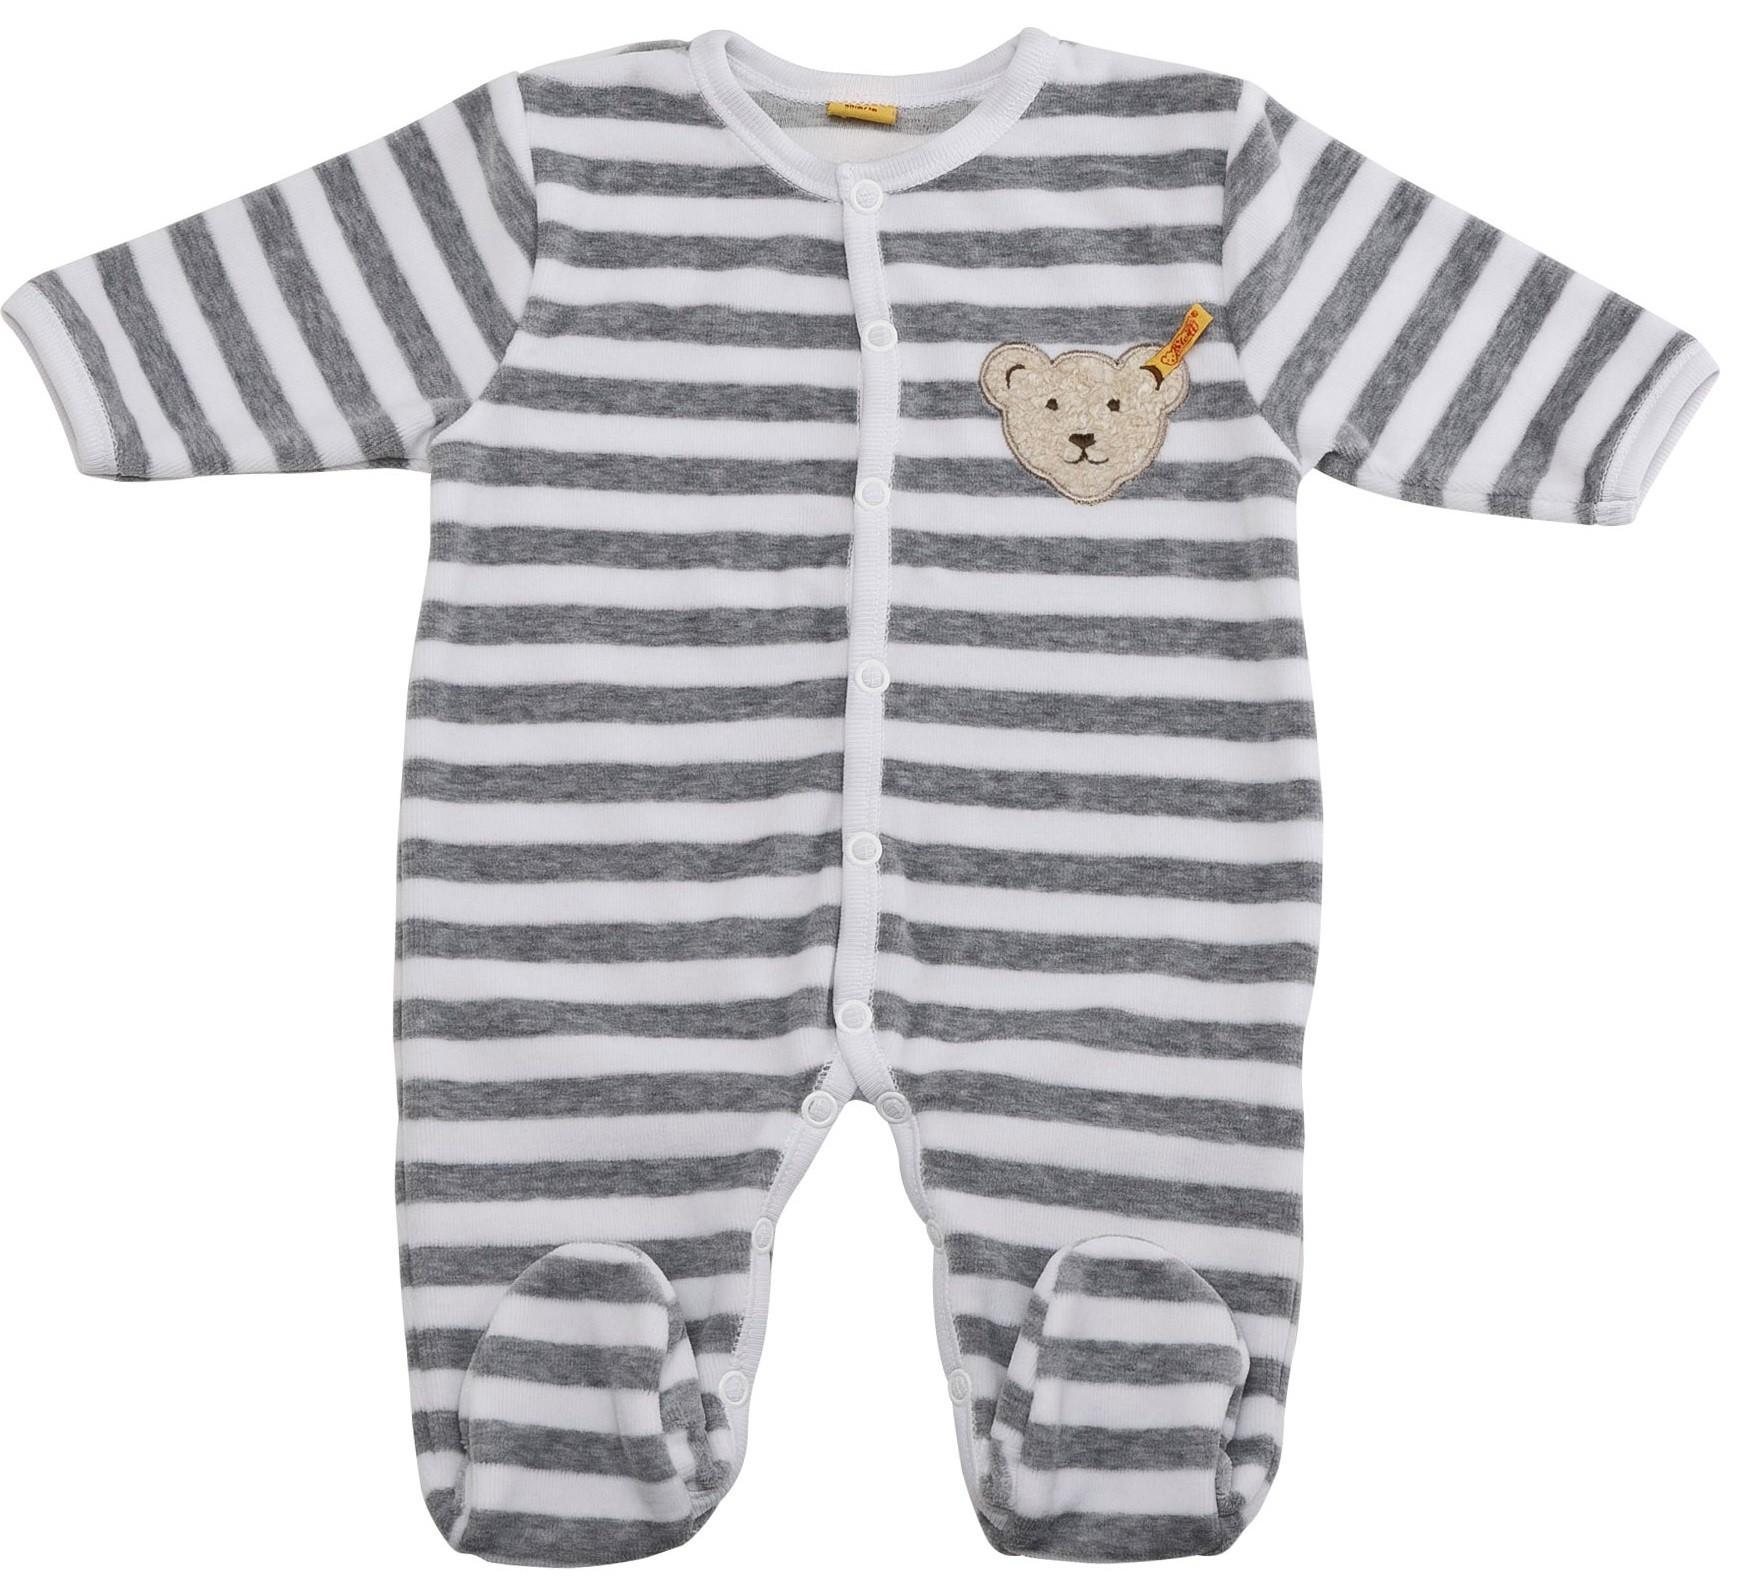 steiff baby nicky strampler schlafanzug gestreift grau. Black Bedroom Furniture Sets. Home Design Ideas